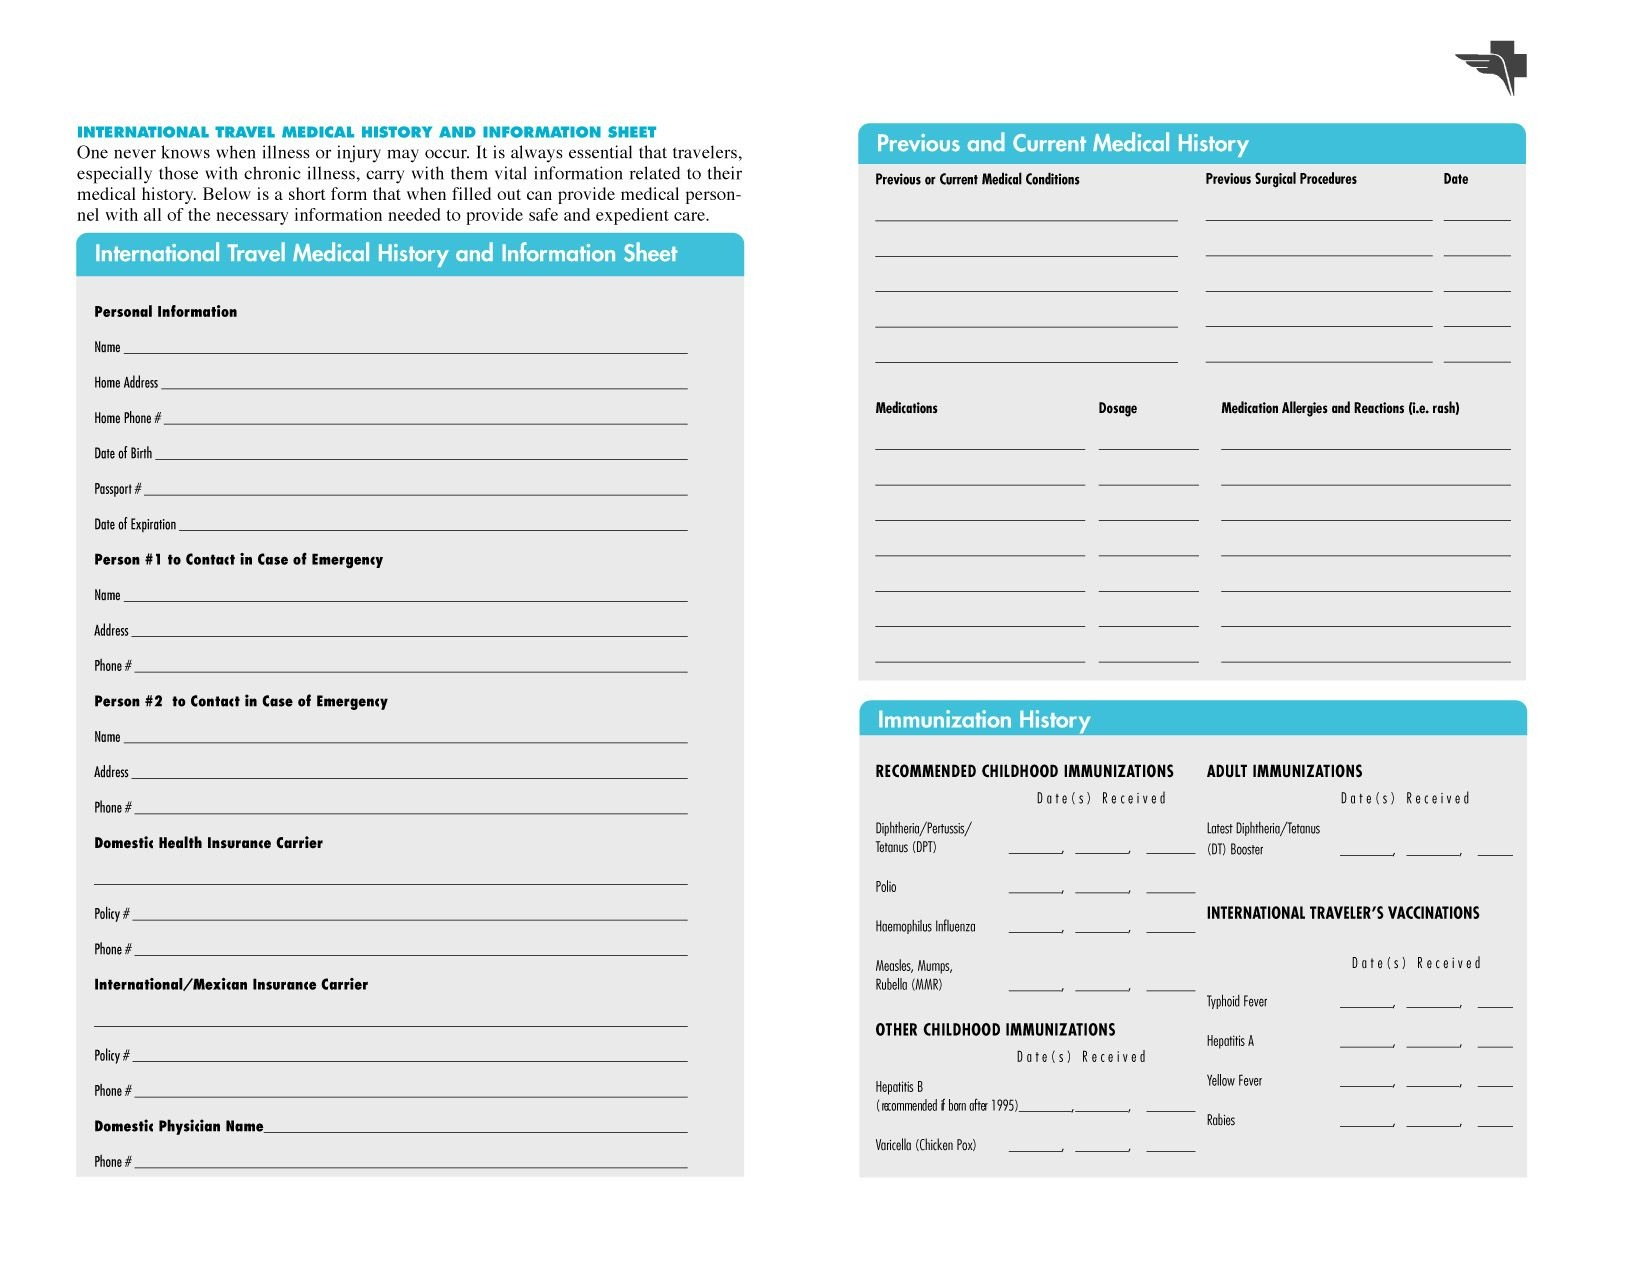 Free Printables | Free Printable Family Medical History Forms - Free Printable Medical Chart Forms